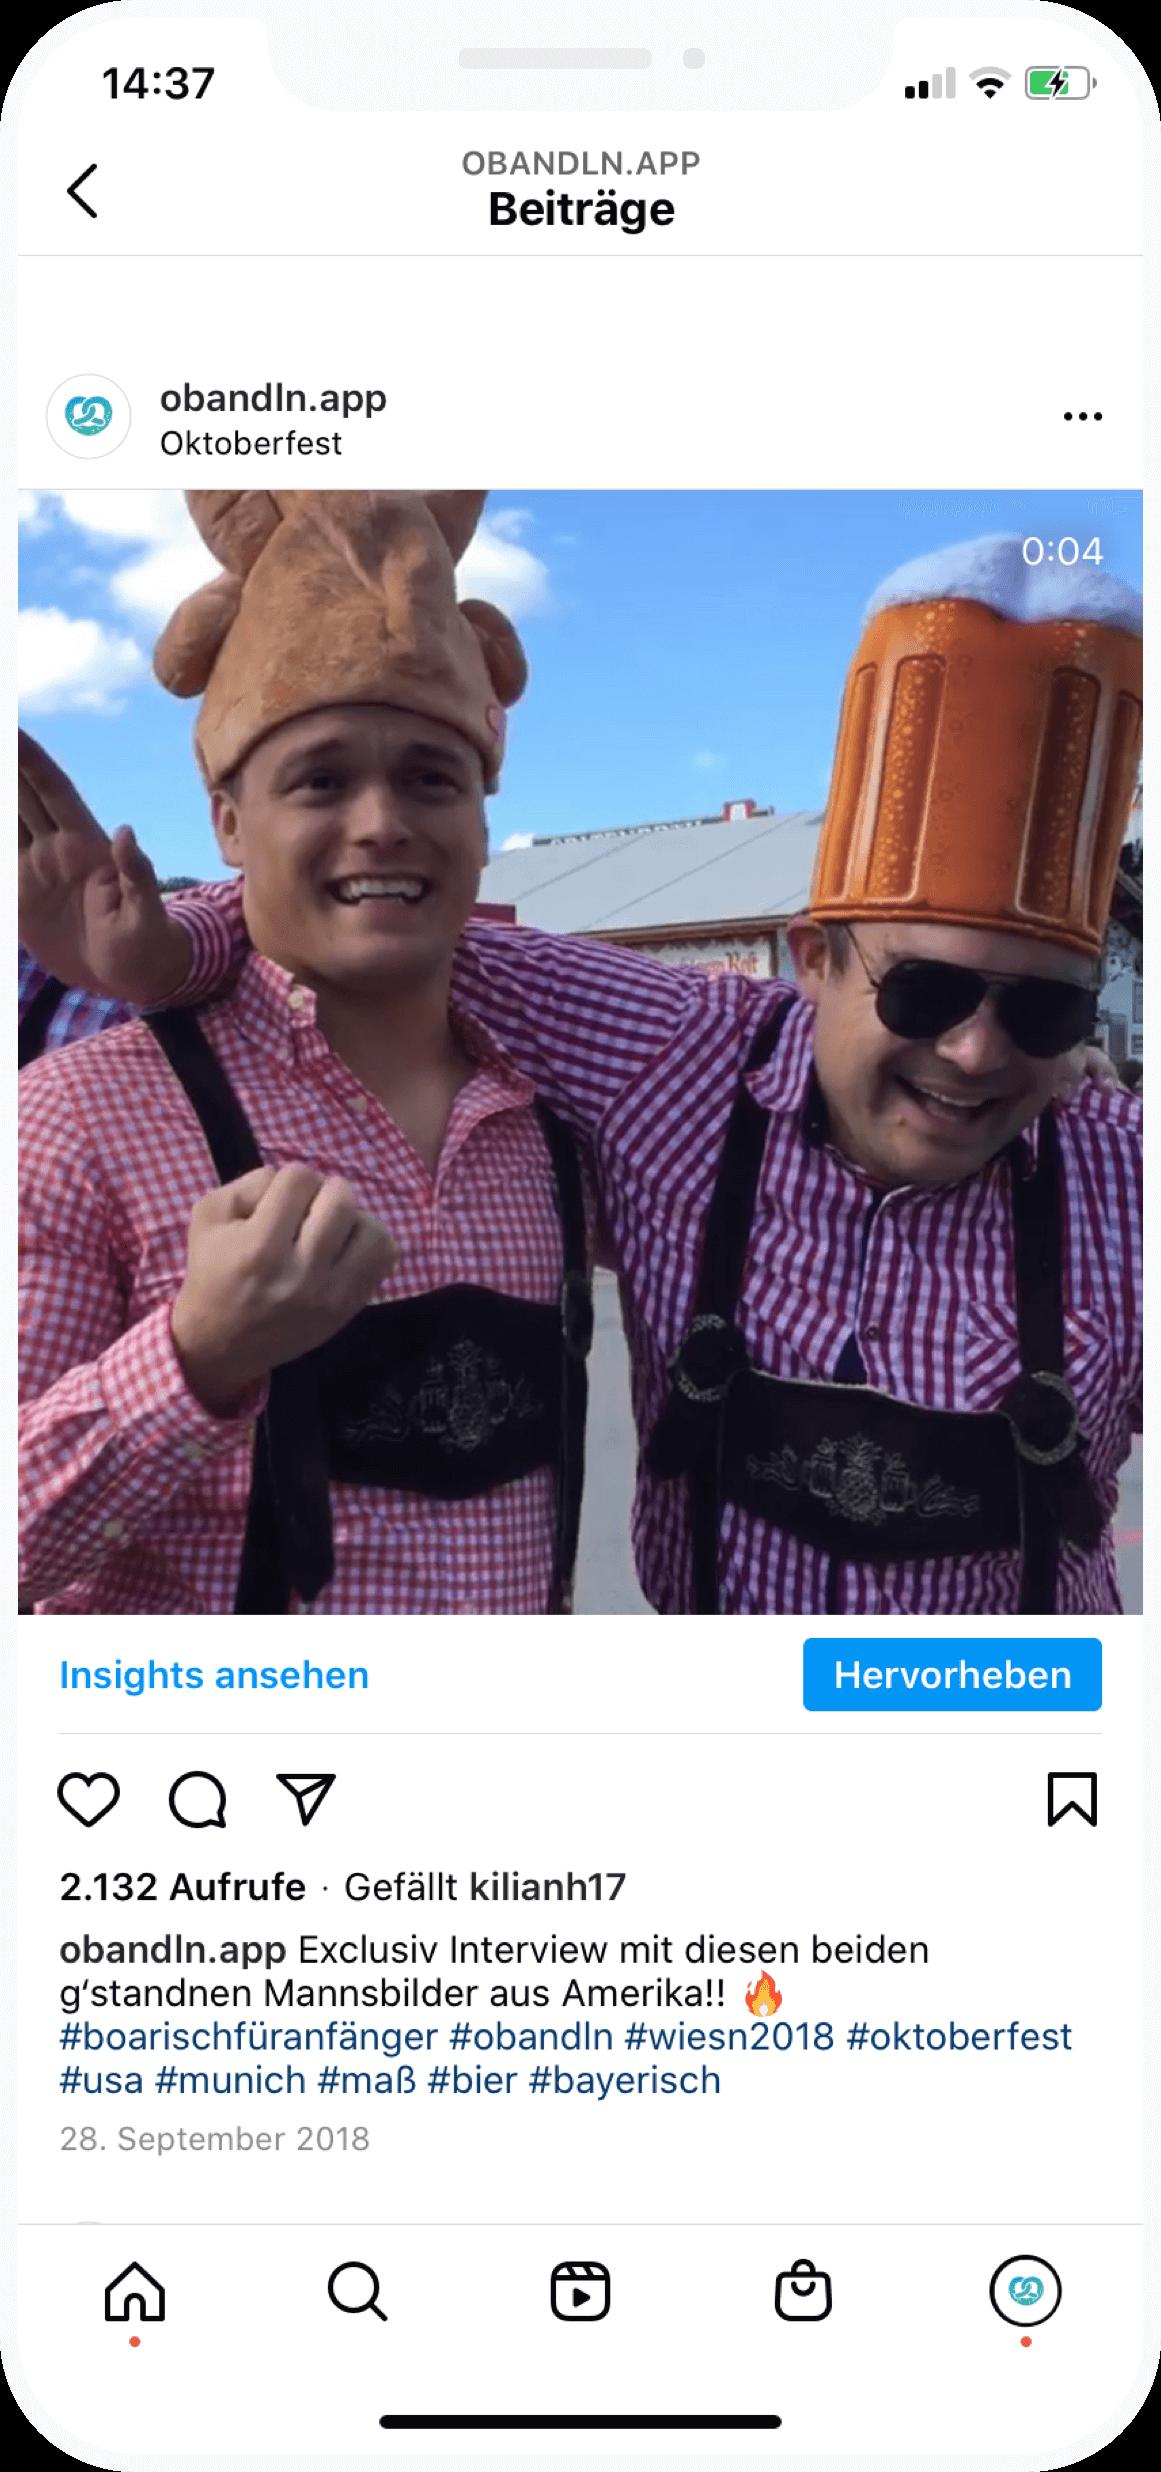 Obandln.app Marketing